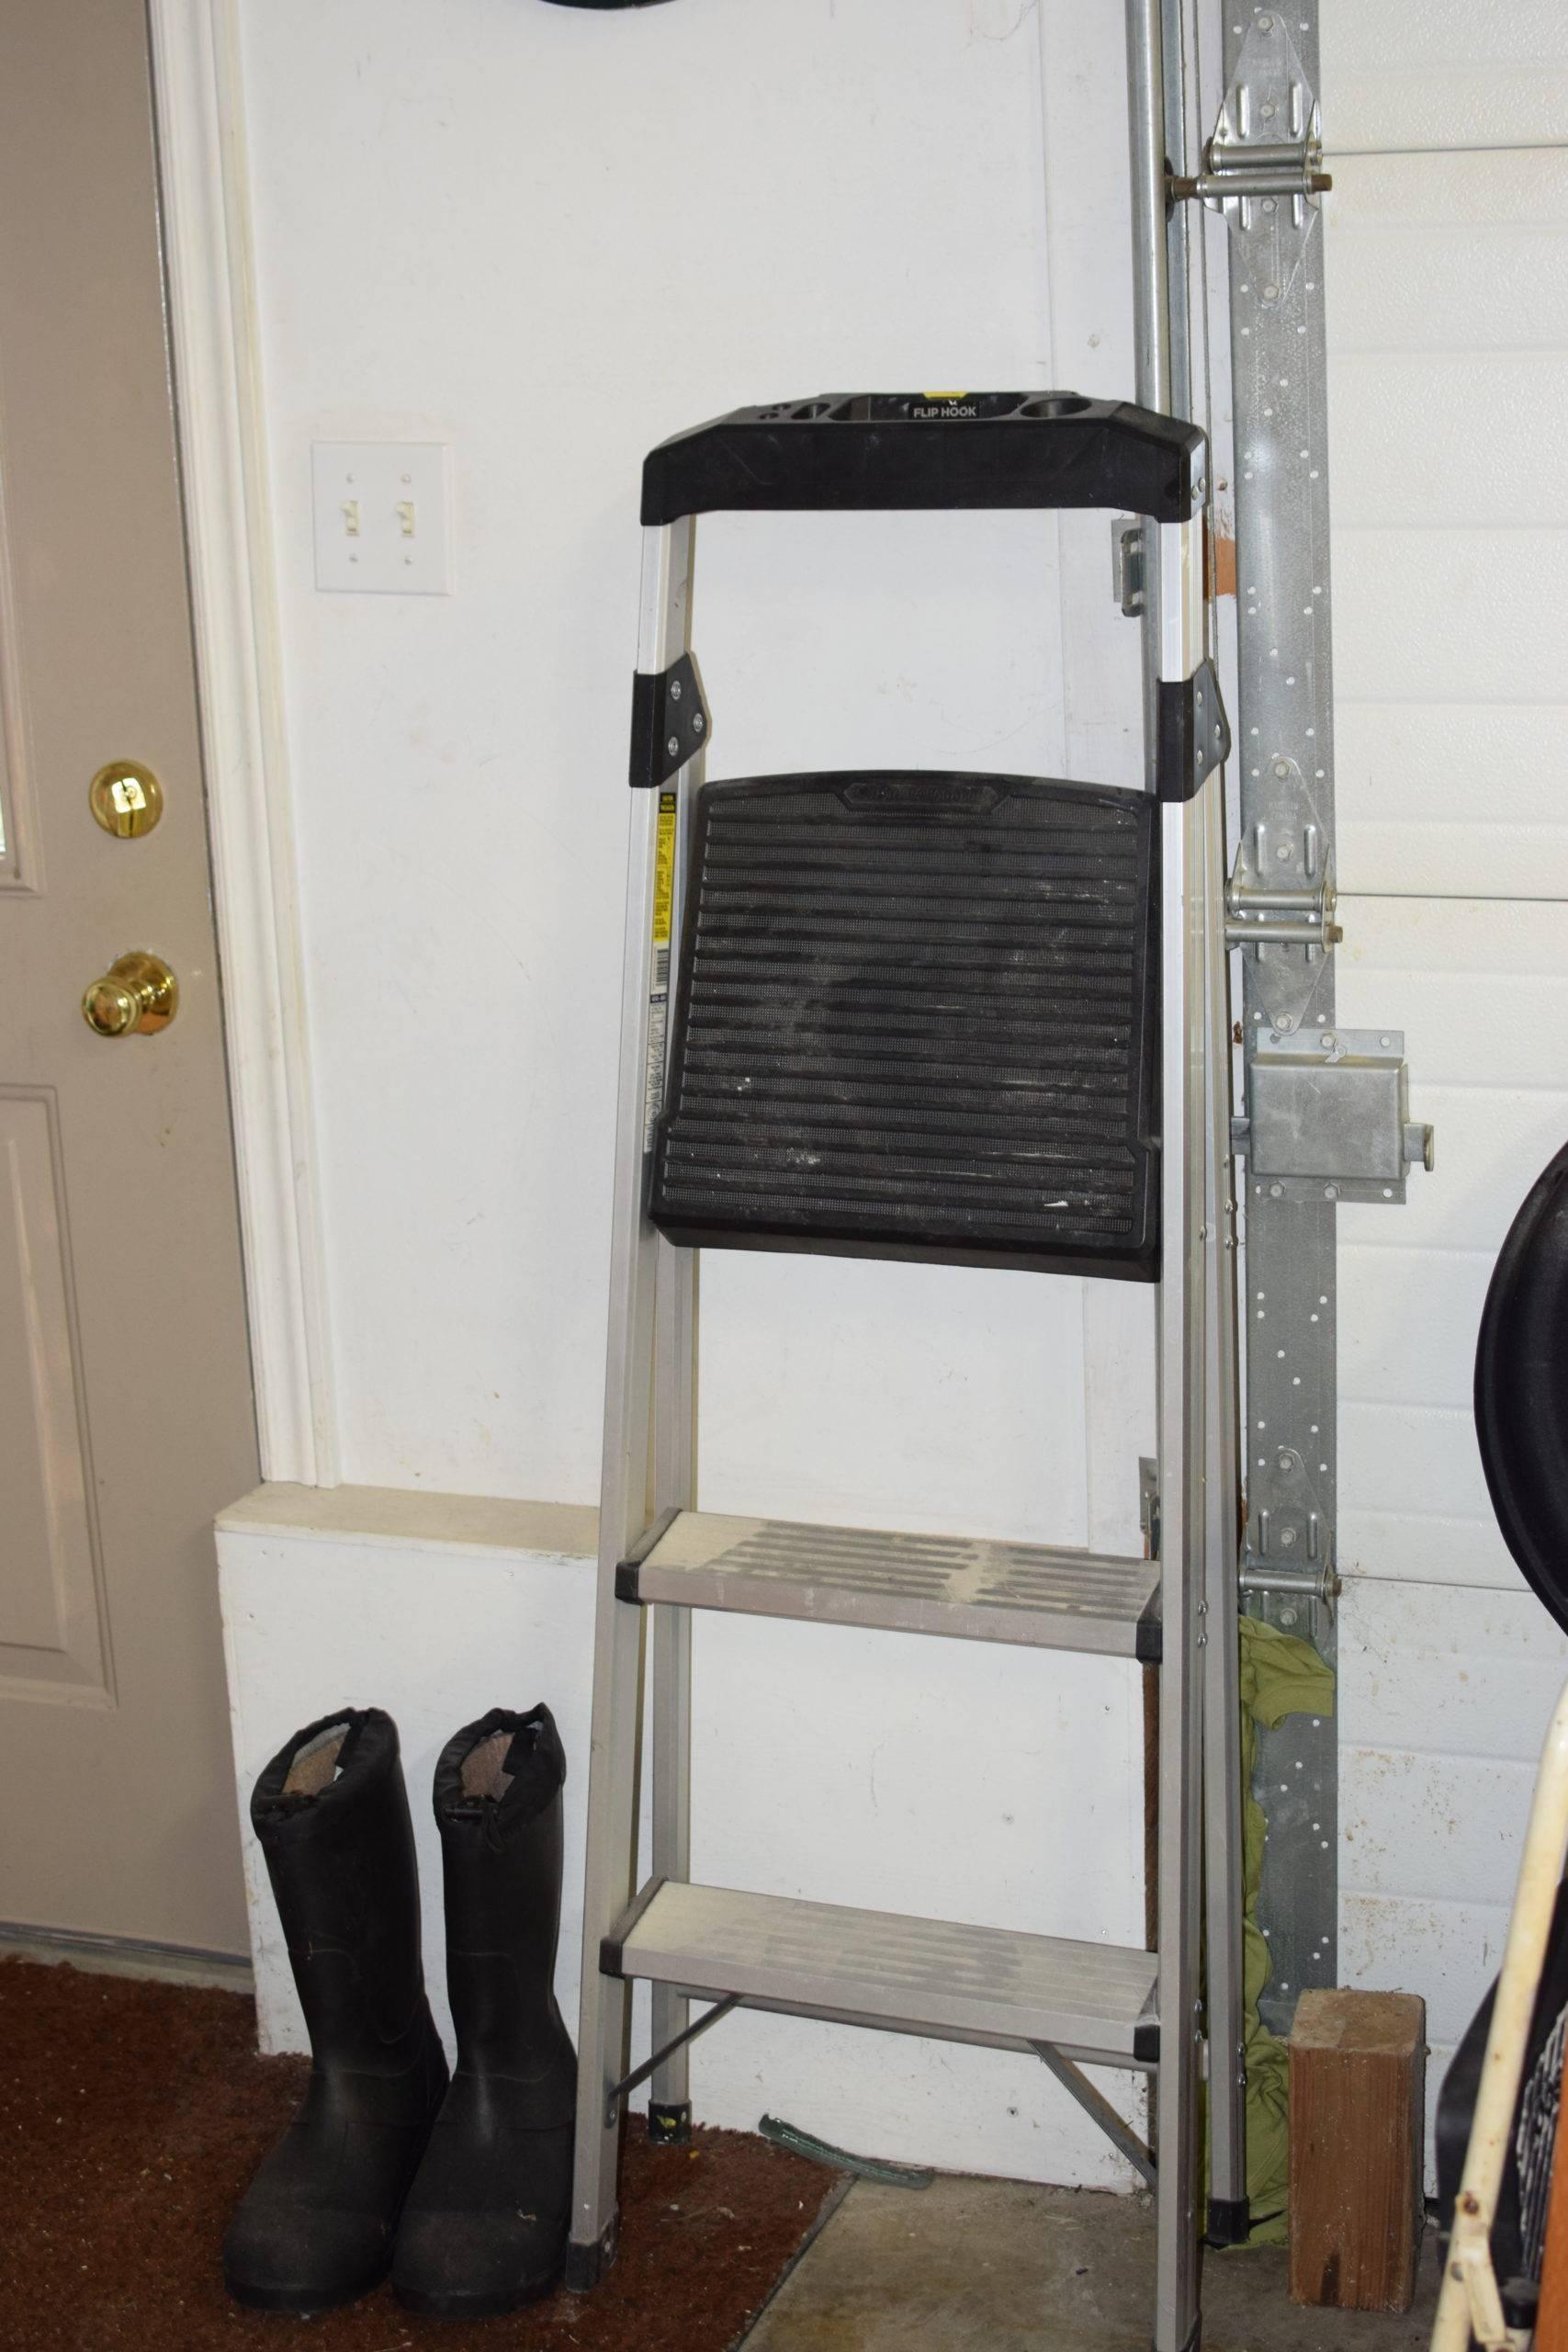 Step up ladder behind black working boots